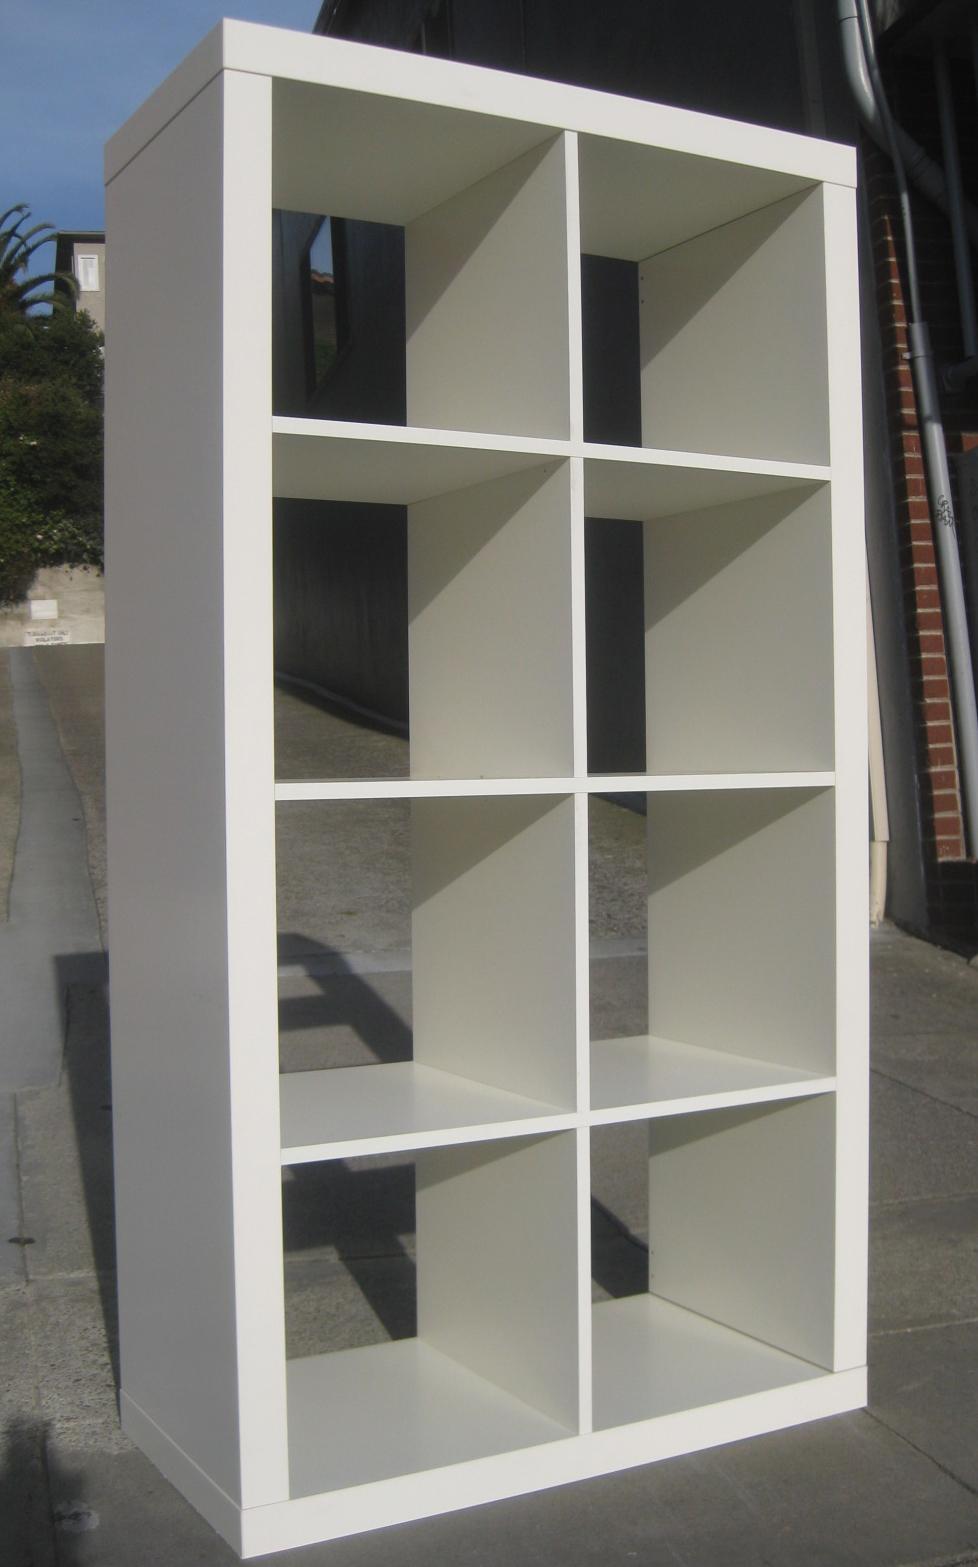 Diy Storage Cube Shelves Home Design Ideas - Ikea Cube Shelves Roselawnlutheran